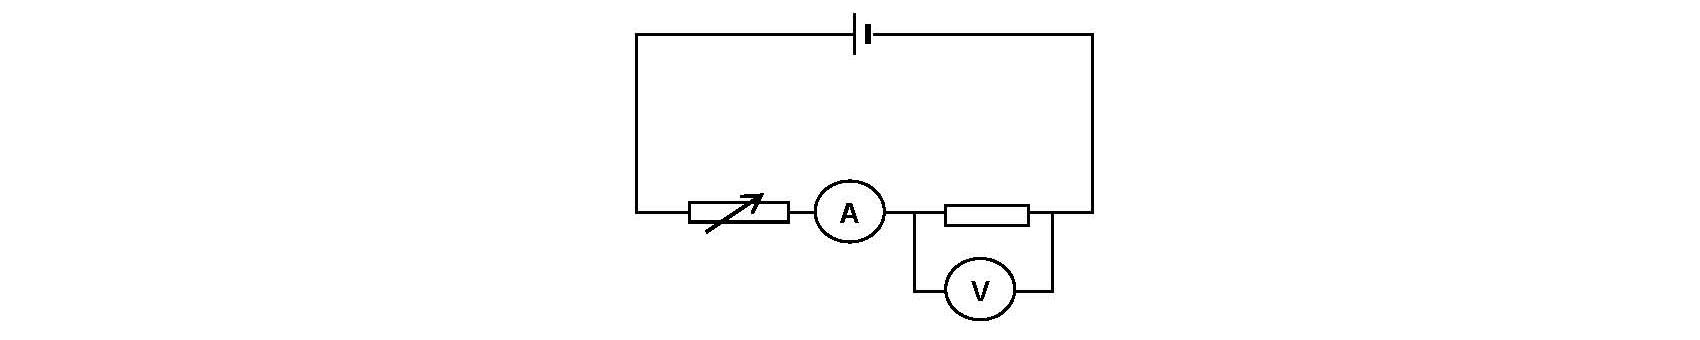 Determining resistance of unknown resistor